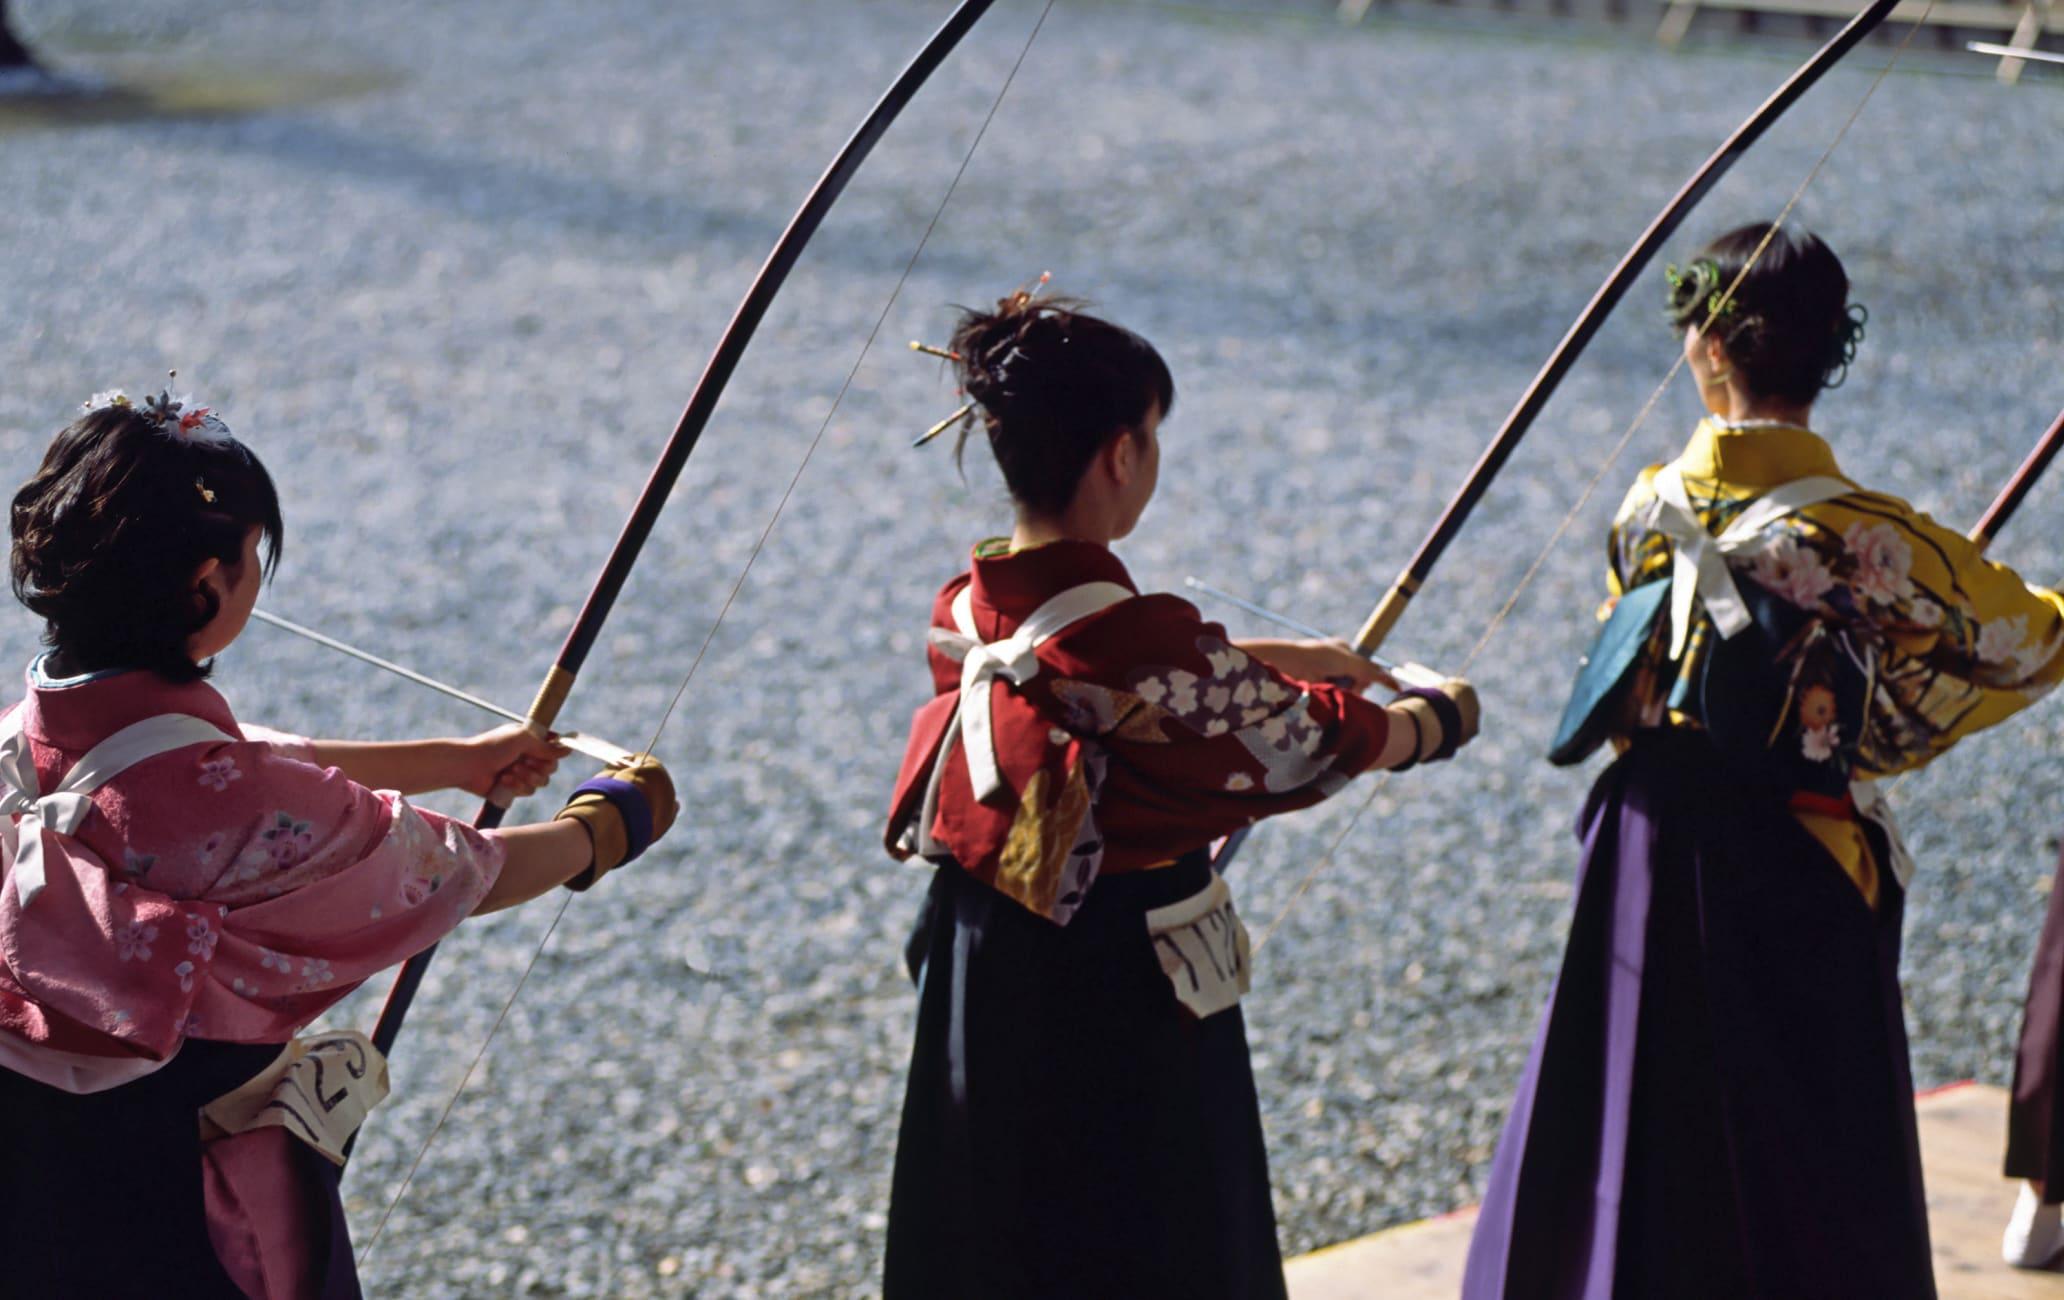 Toh-shiya-Archery Contest